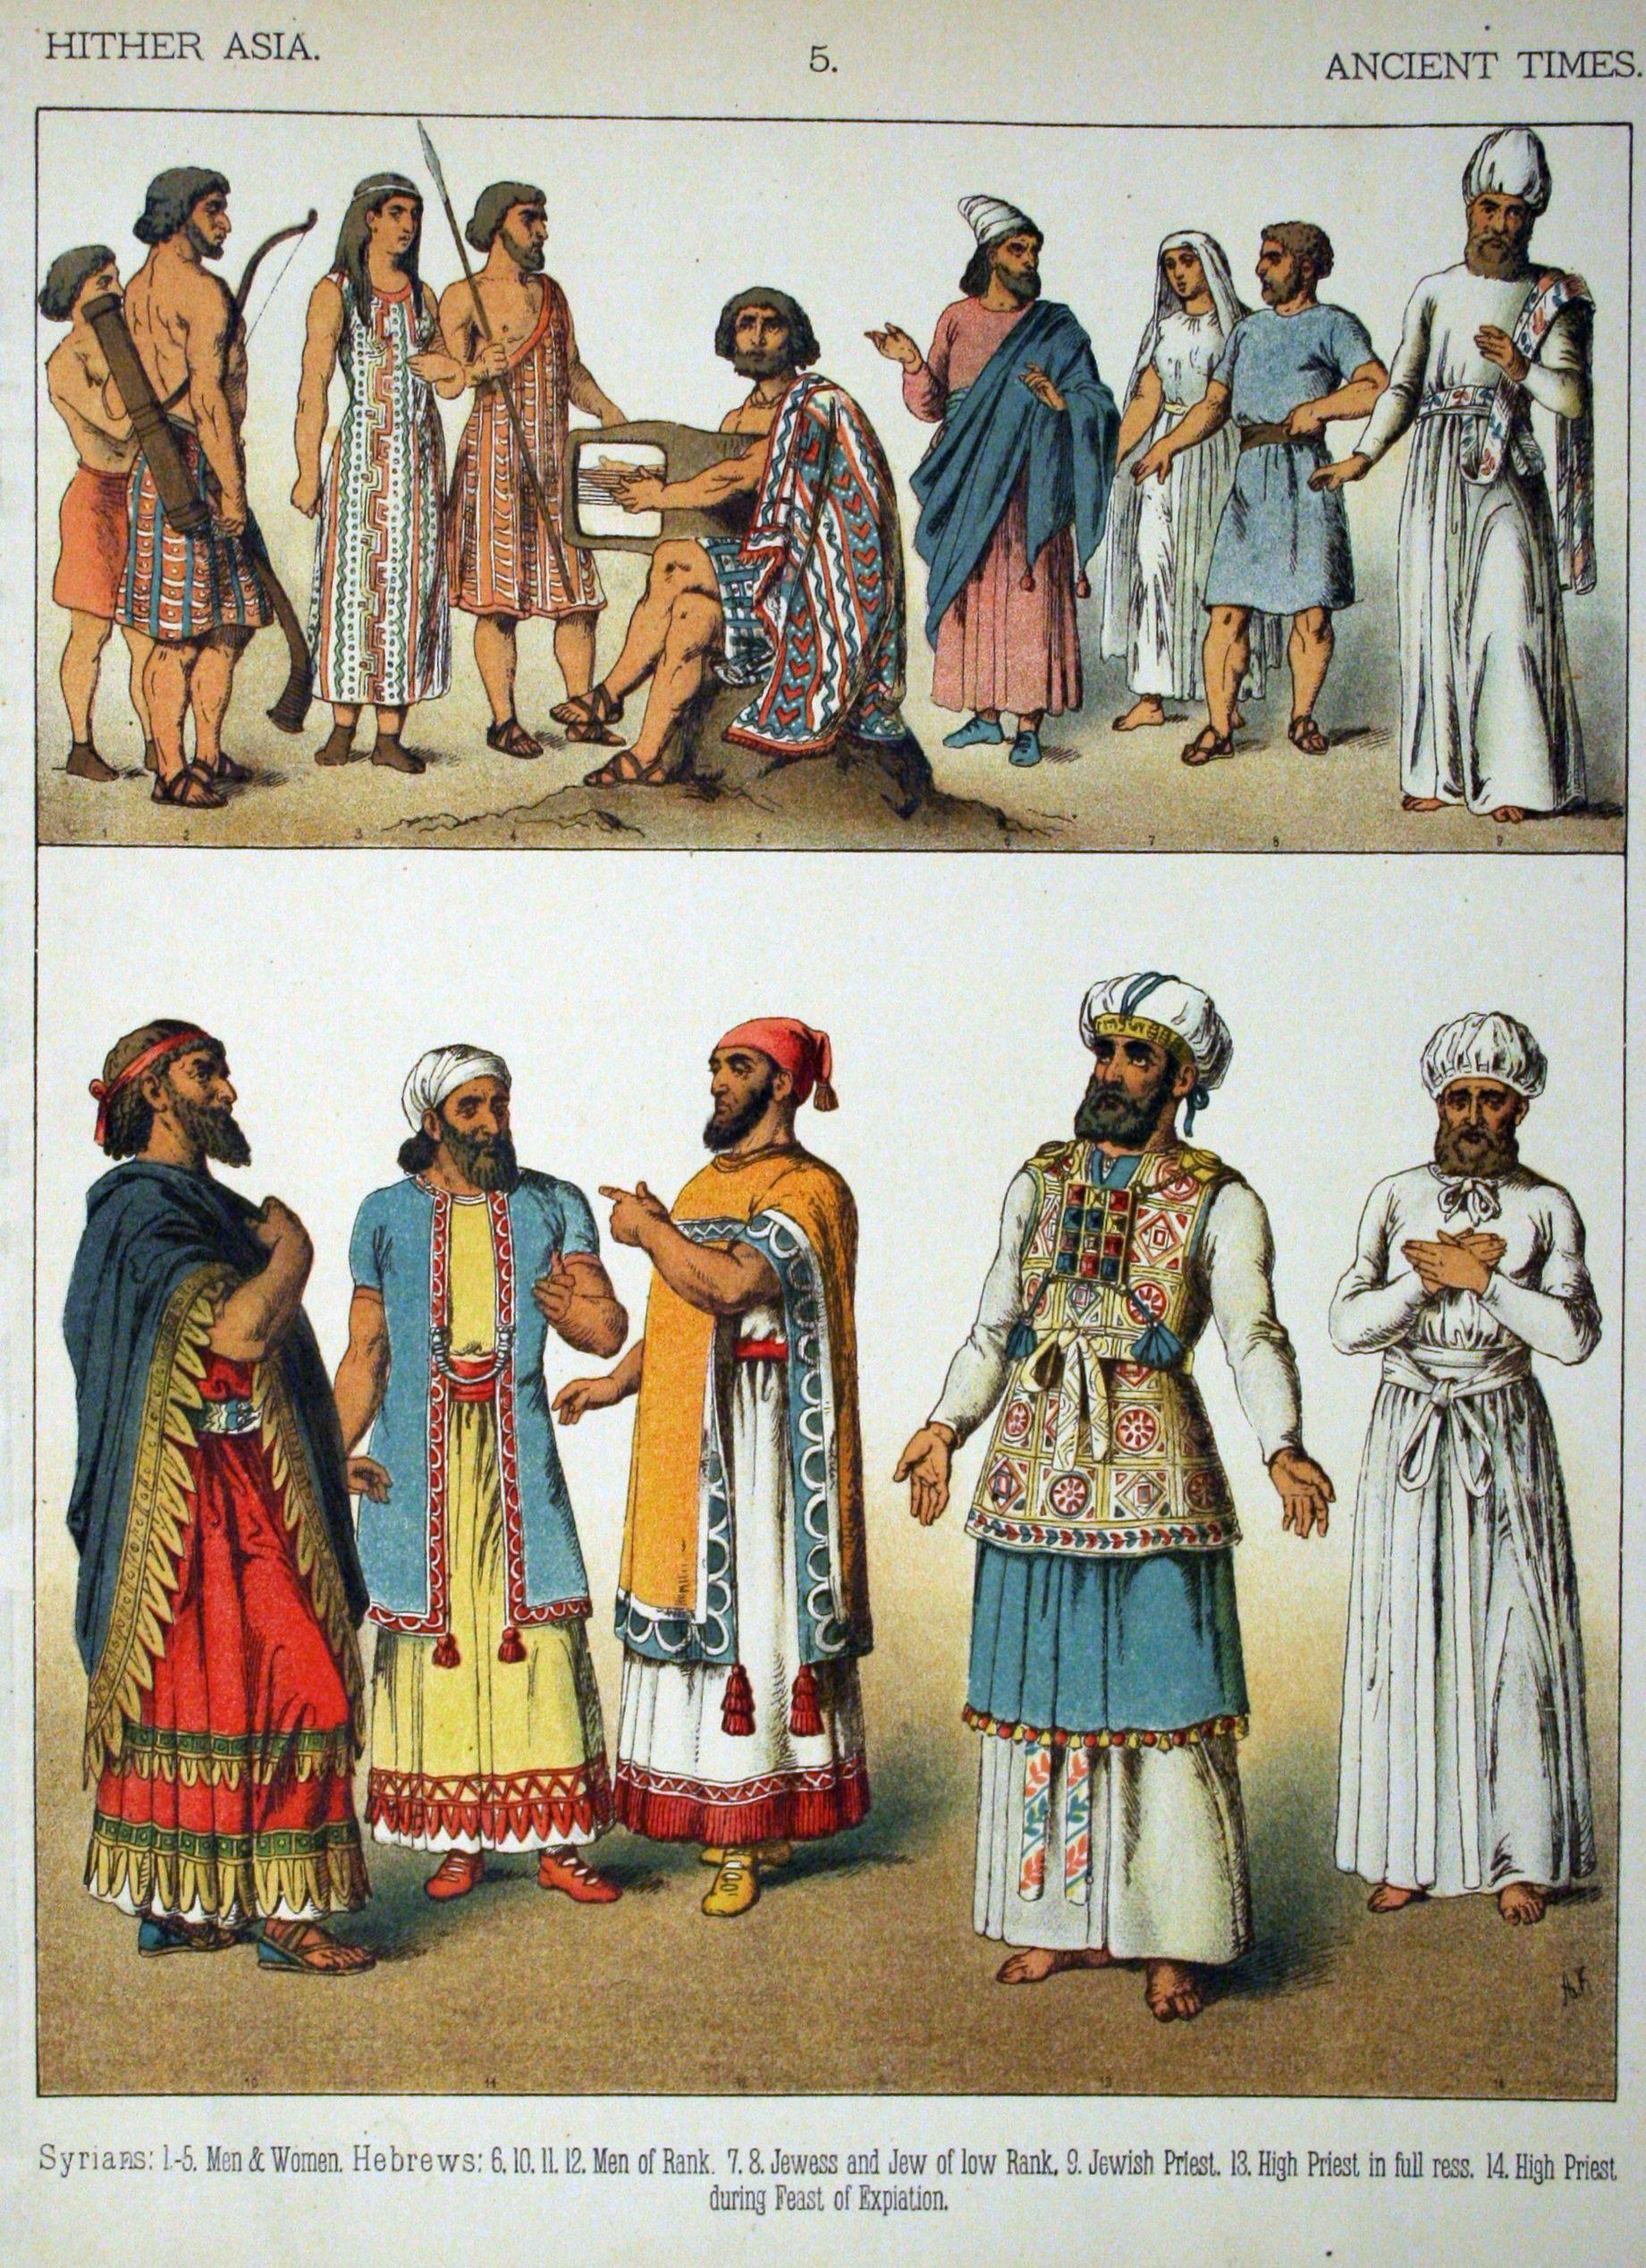 Http Kendallredburn Com Images Costumesofallnations Img 5865 Jpg Chromolithograph Ancient Ancient Times